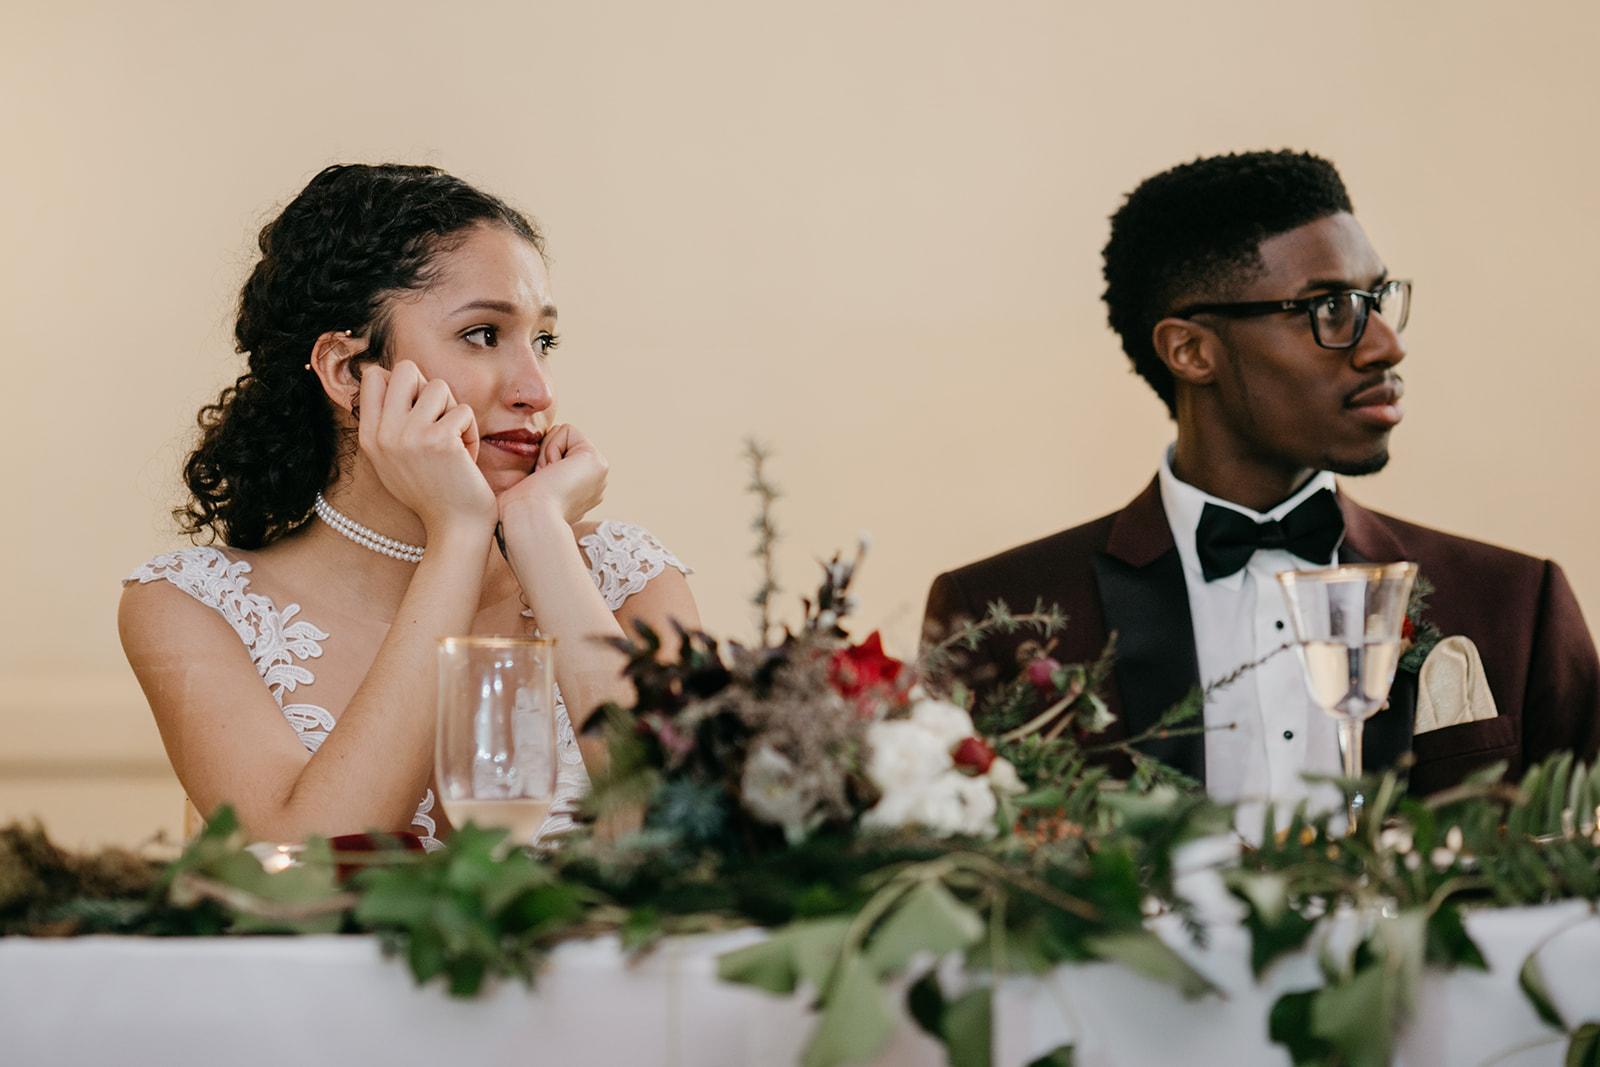 portland - wedding - photographer - doorofhopechurch634.jpg